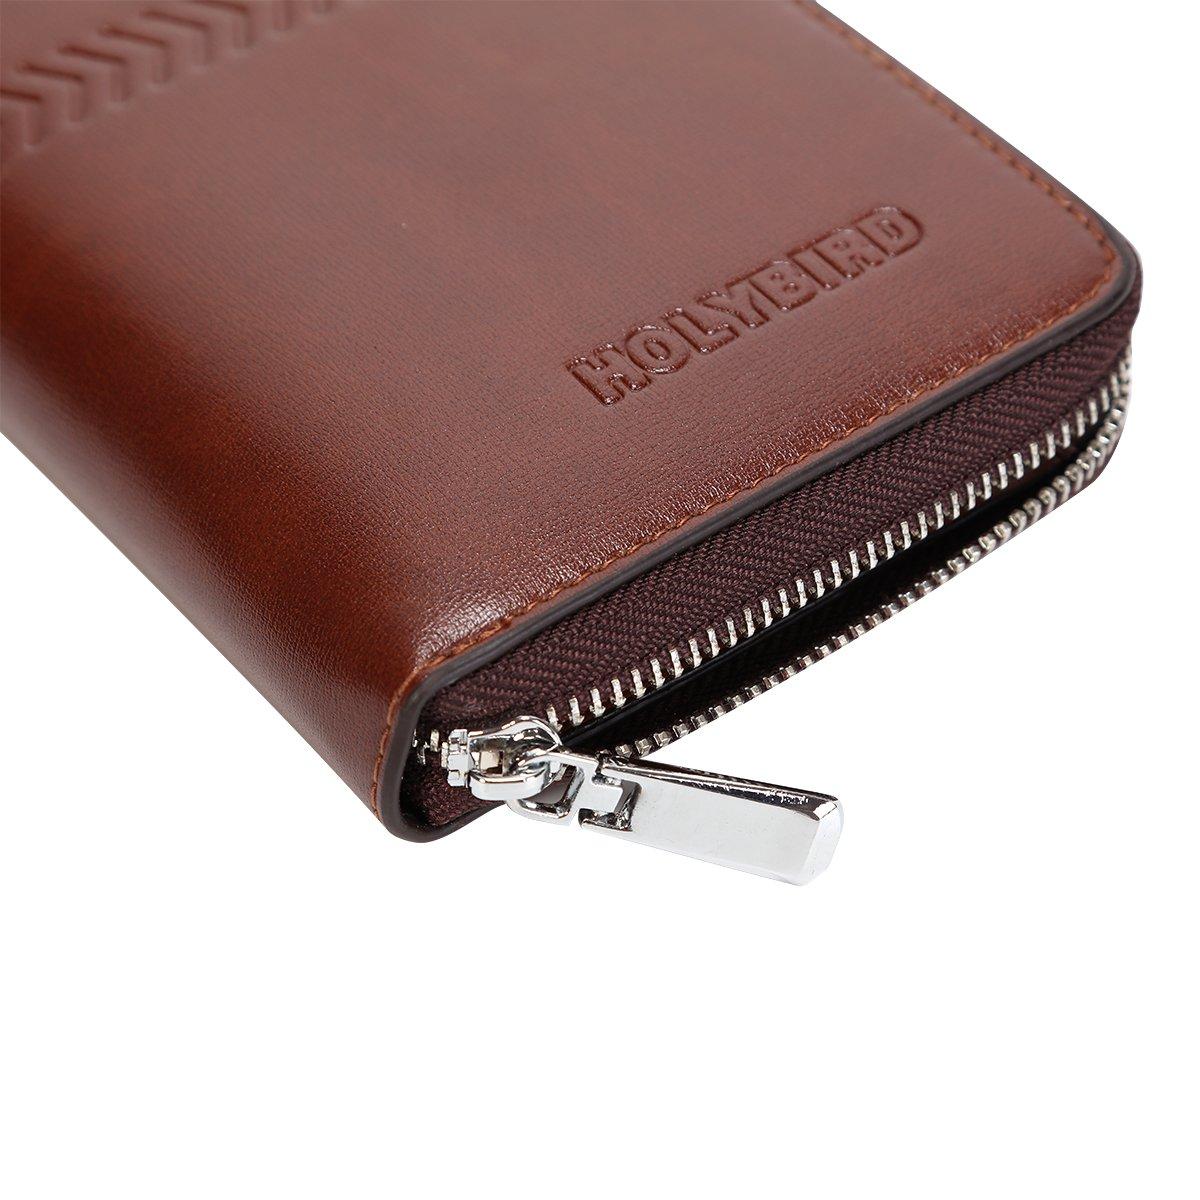 Mens Clutch Genuine Leather Handbag Organizer Checkbook Wallet Card Case by HOLYBIRD (Image #3)